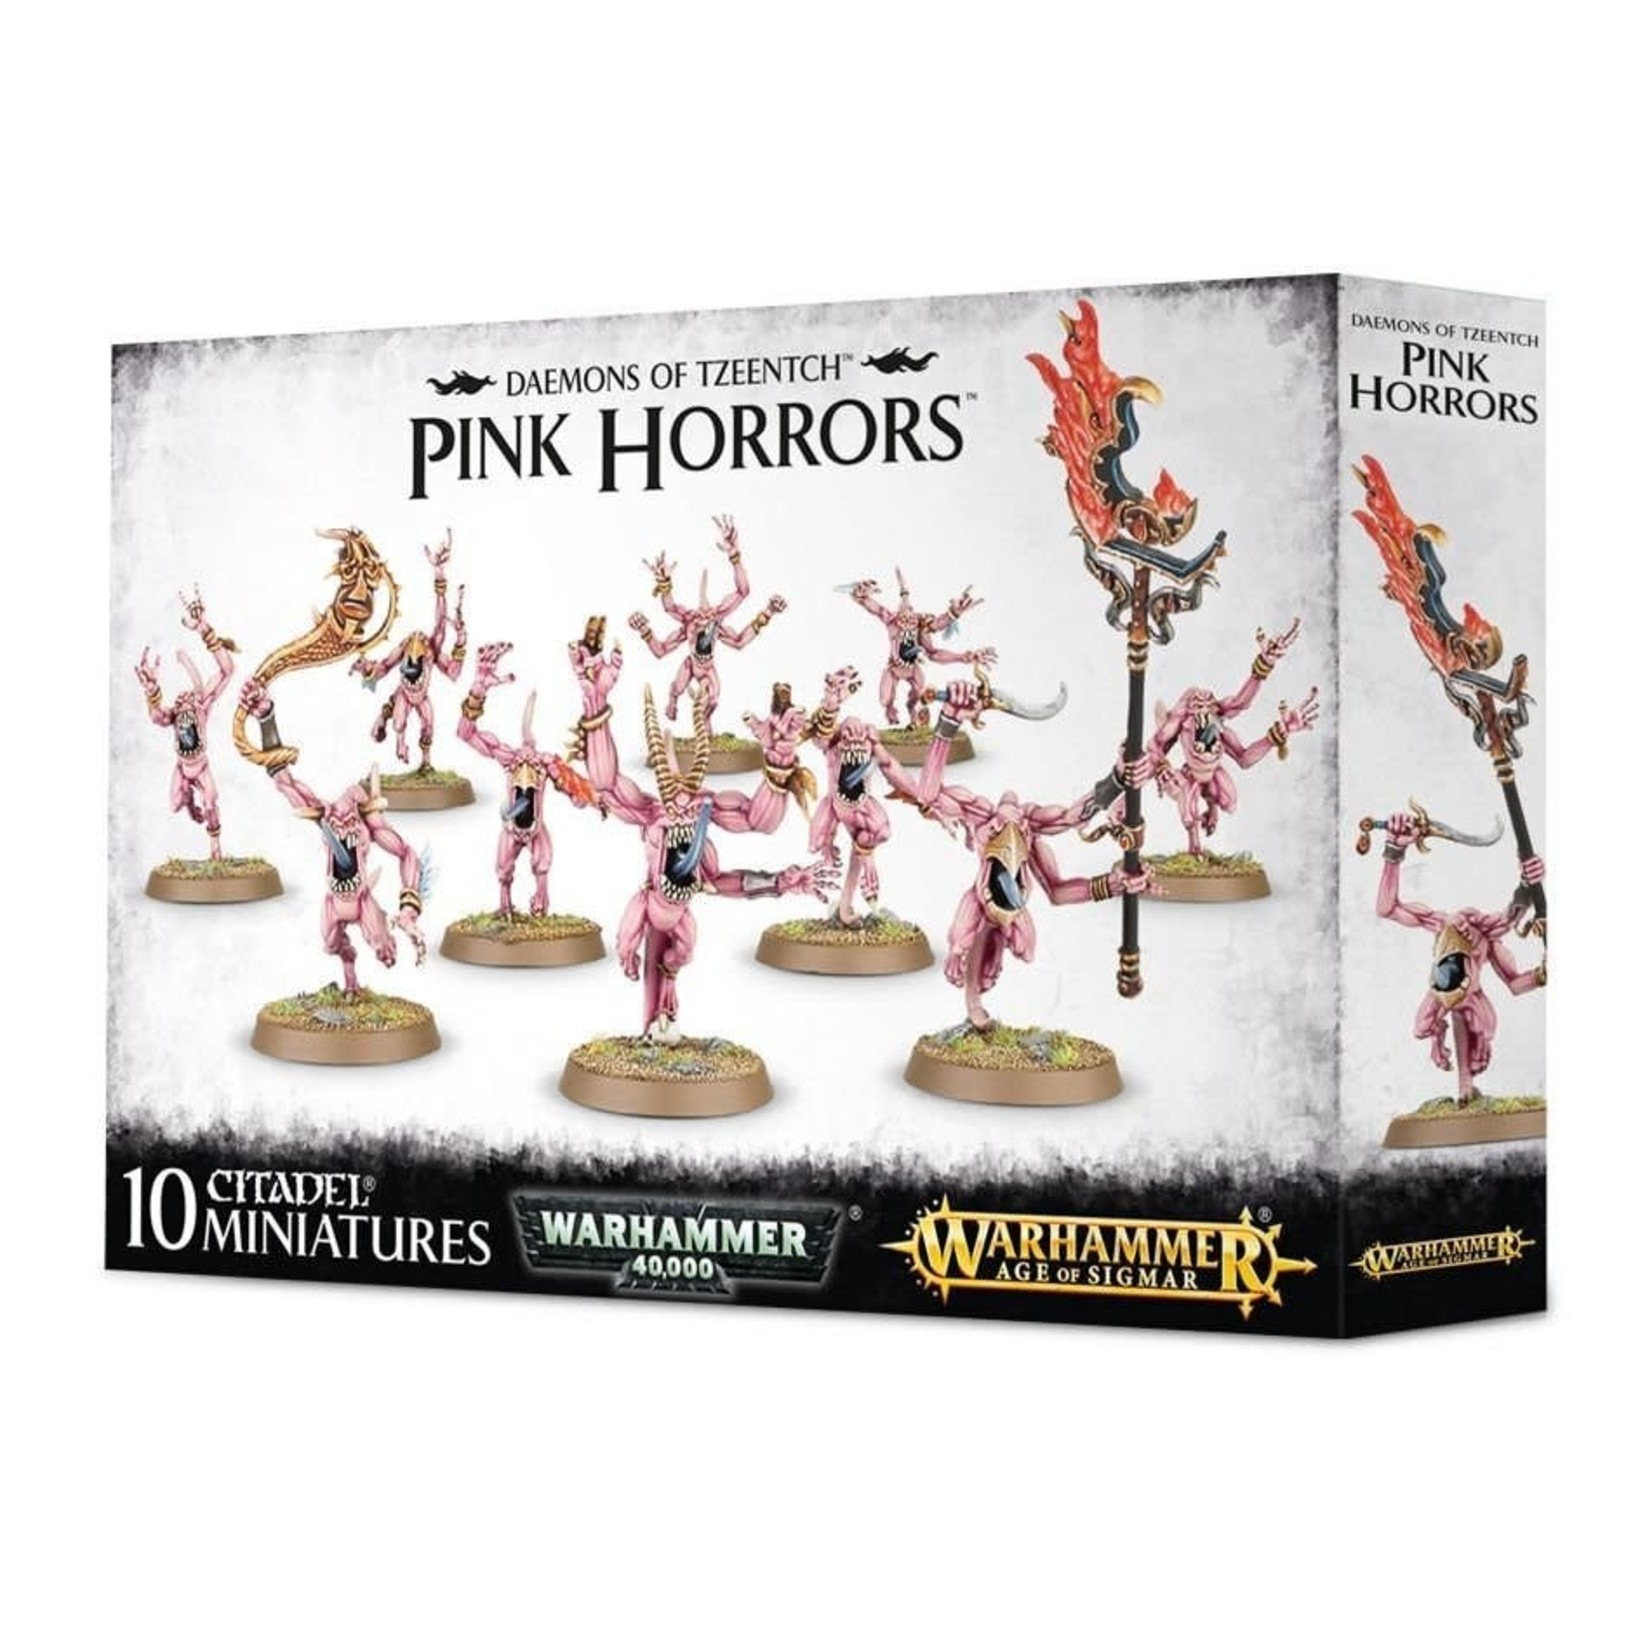 Games Workshop Warhammer Age of Sigmar: Daemons of Tzeentch: Pink Horrors